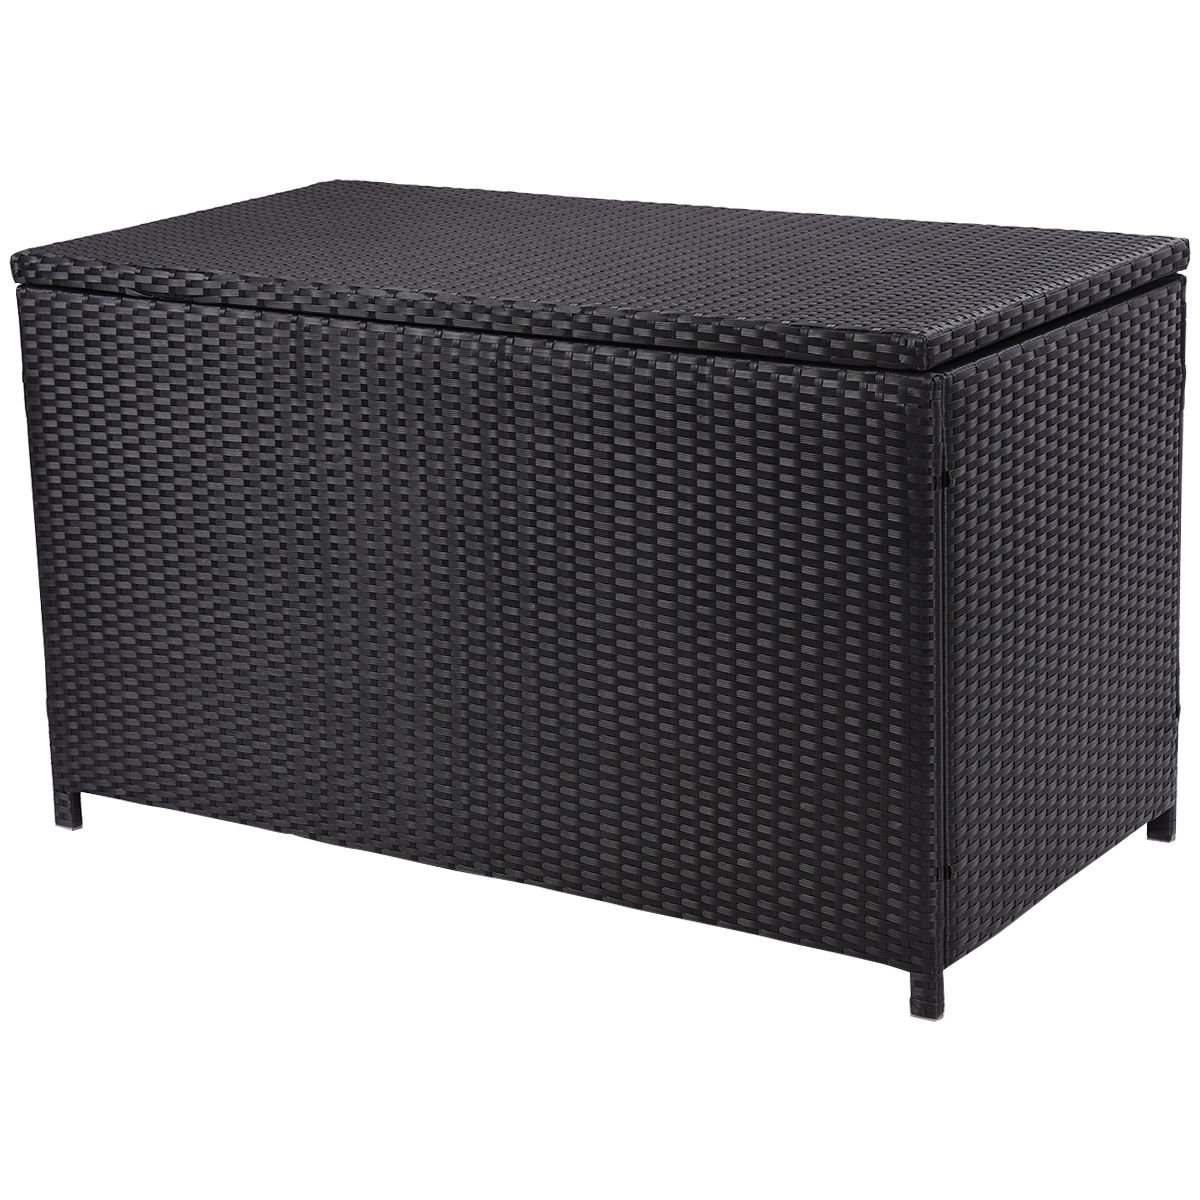 Giantex 47 black outdoor wicker deck cushion storage box furniture patio garden amazon ca patio lawn garden